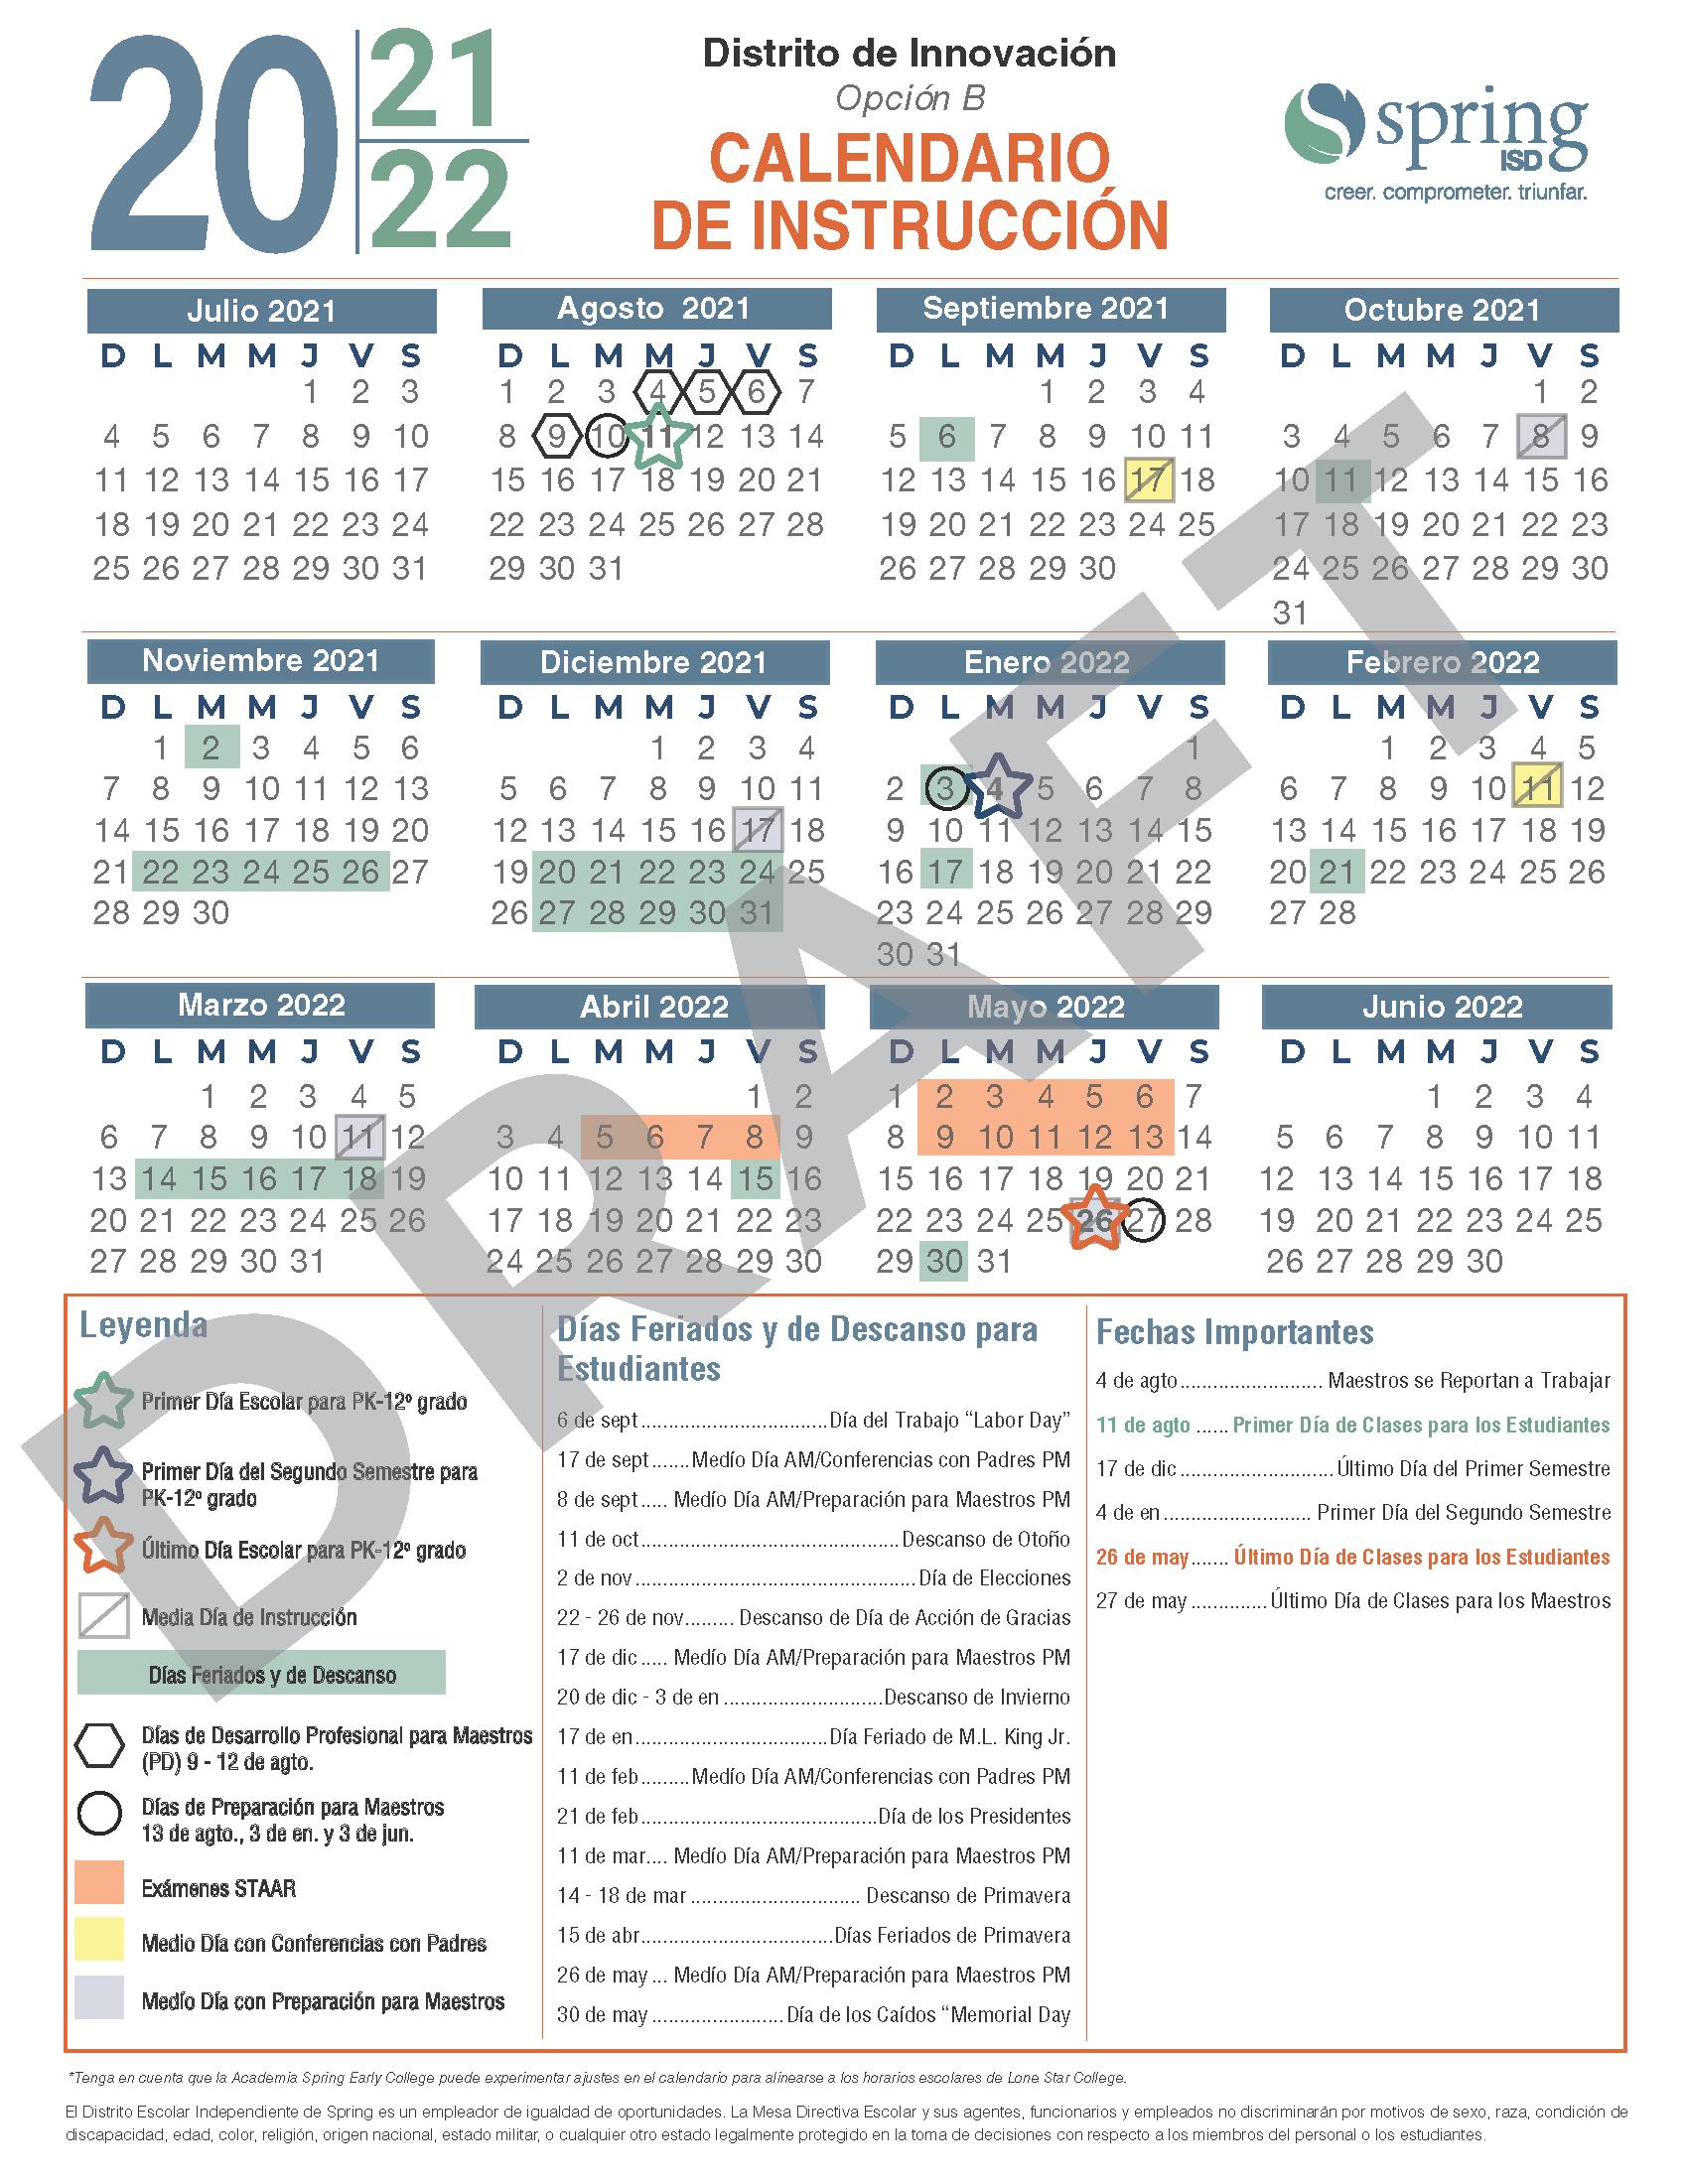 Hisd 2022 Calendar.Calendar Survey 2021 22 Instructional Calendar Survey Encuesta Sobre El Calendario De Instruccio